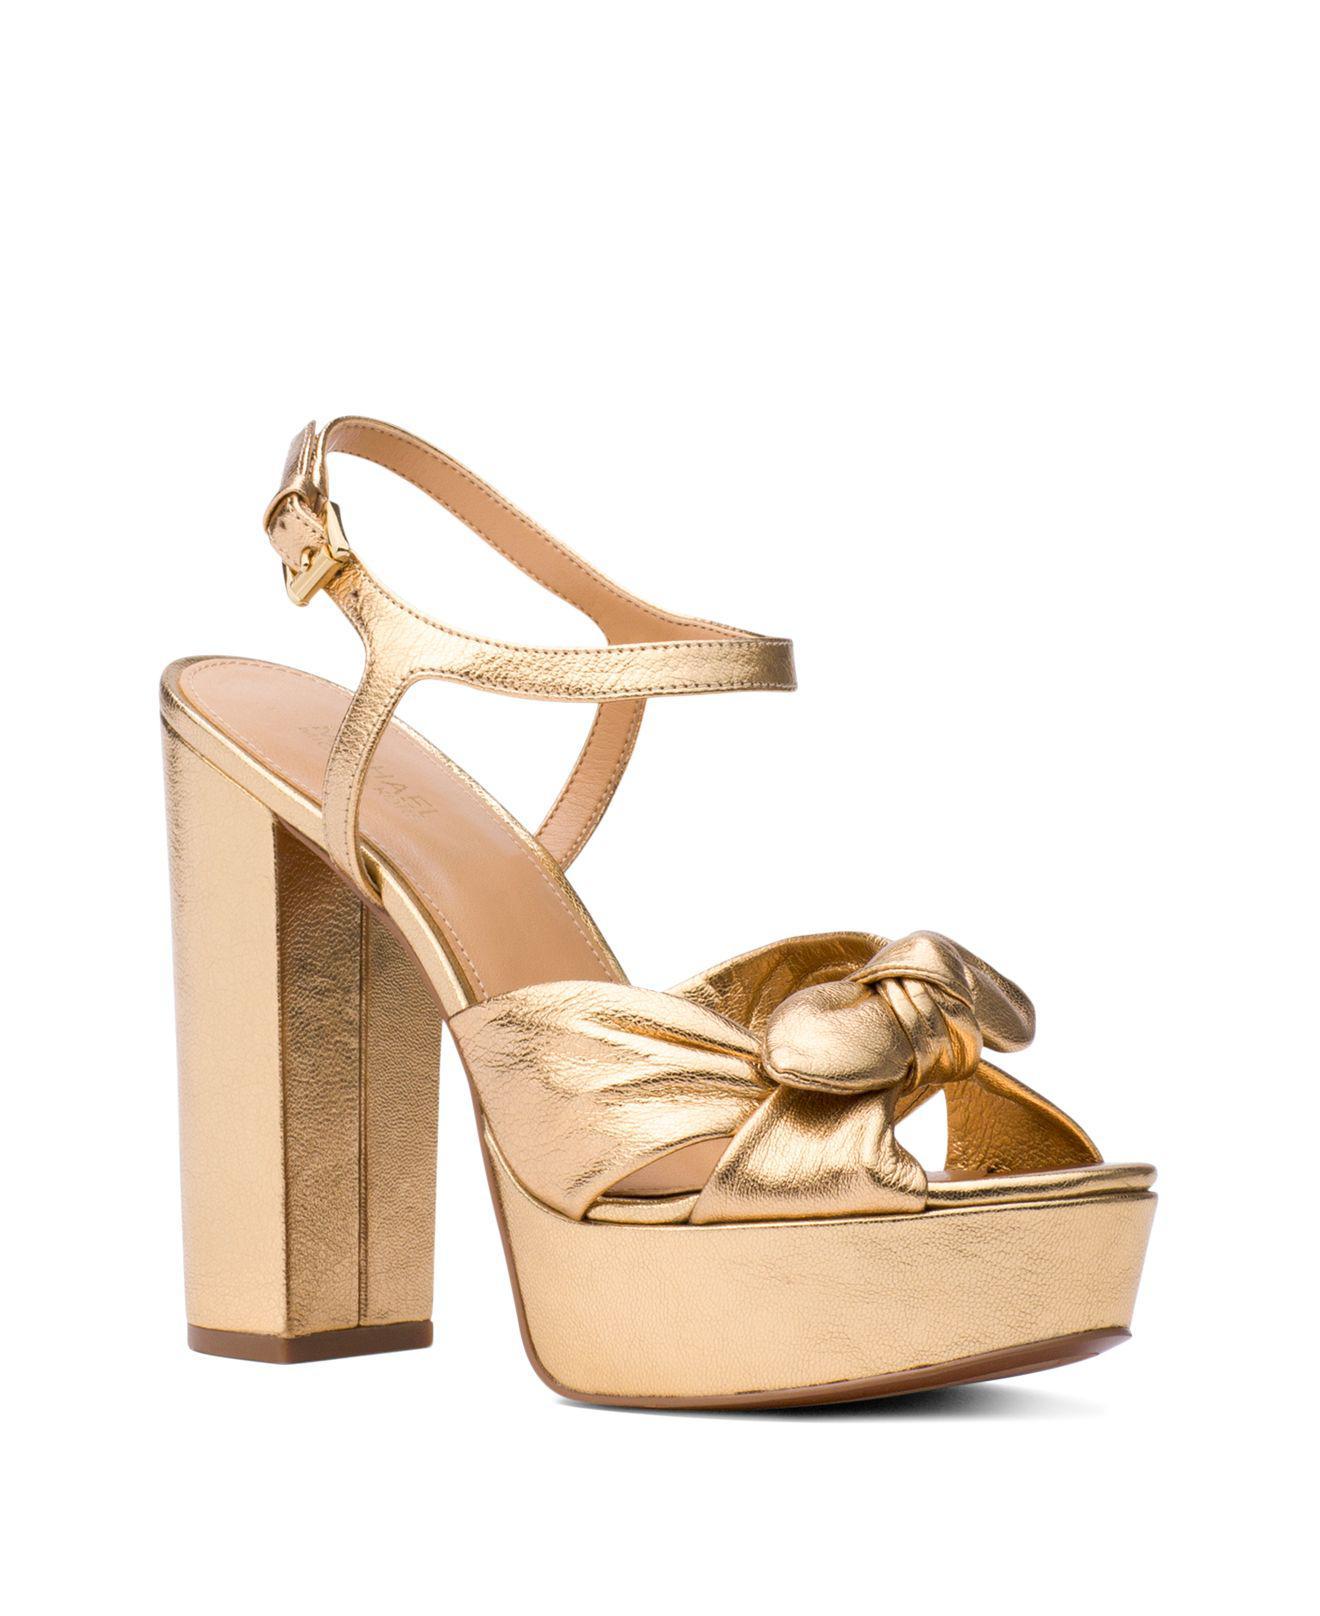 KOw2qnFkC7 Womens Pippa Leather Platform High-Heel Sandals Z17Gdocd